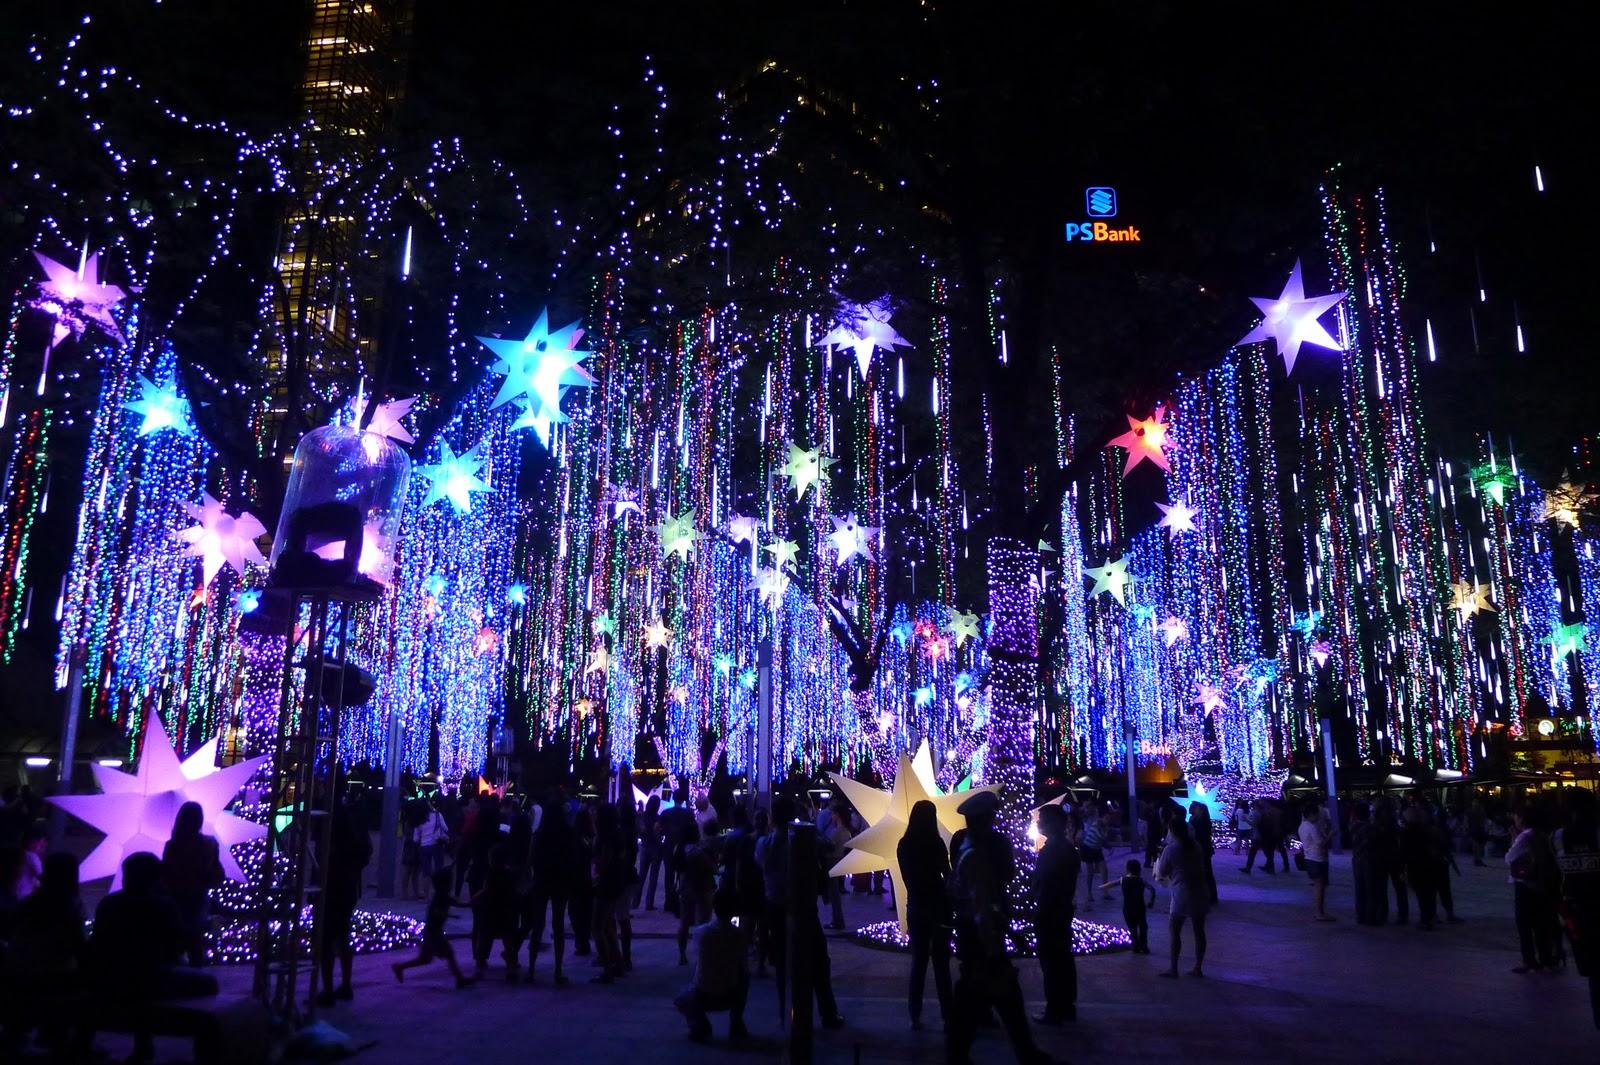 Garlandchristmaslightstreebokehlightswinterhdwallpaper Christmas Lights HD Wallpapers Pop 1600x1065